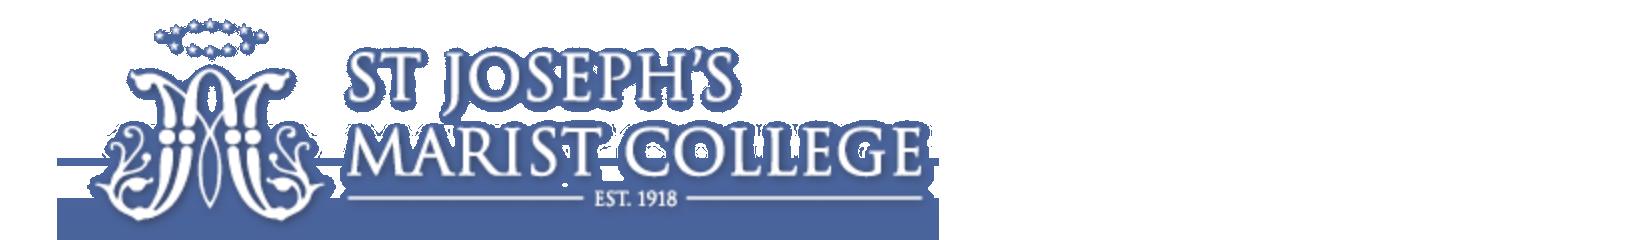 St Joseph's Marist College